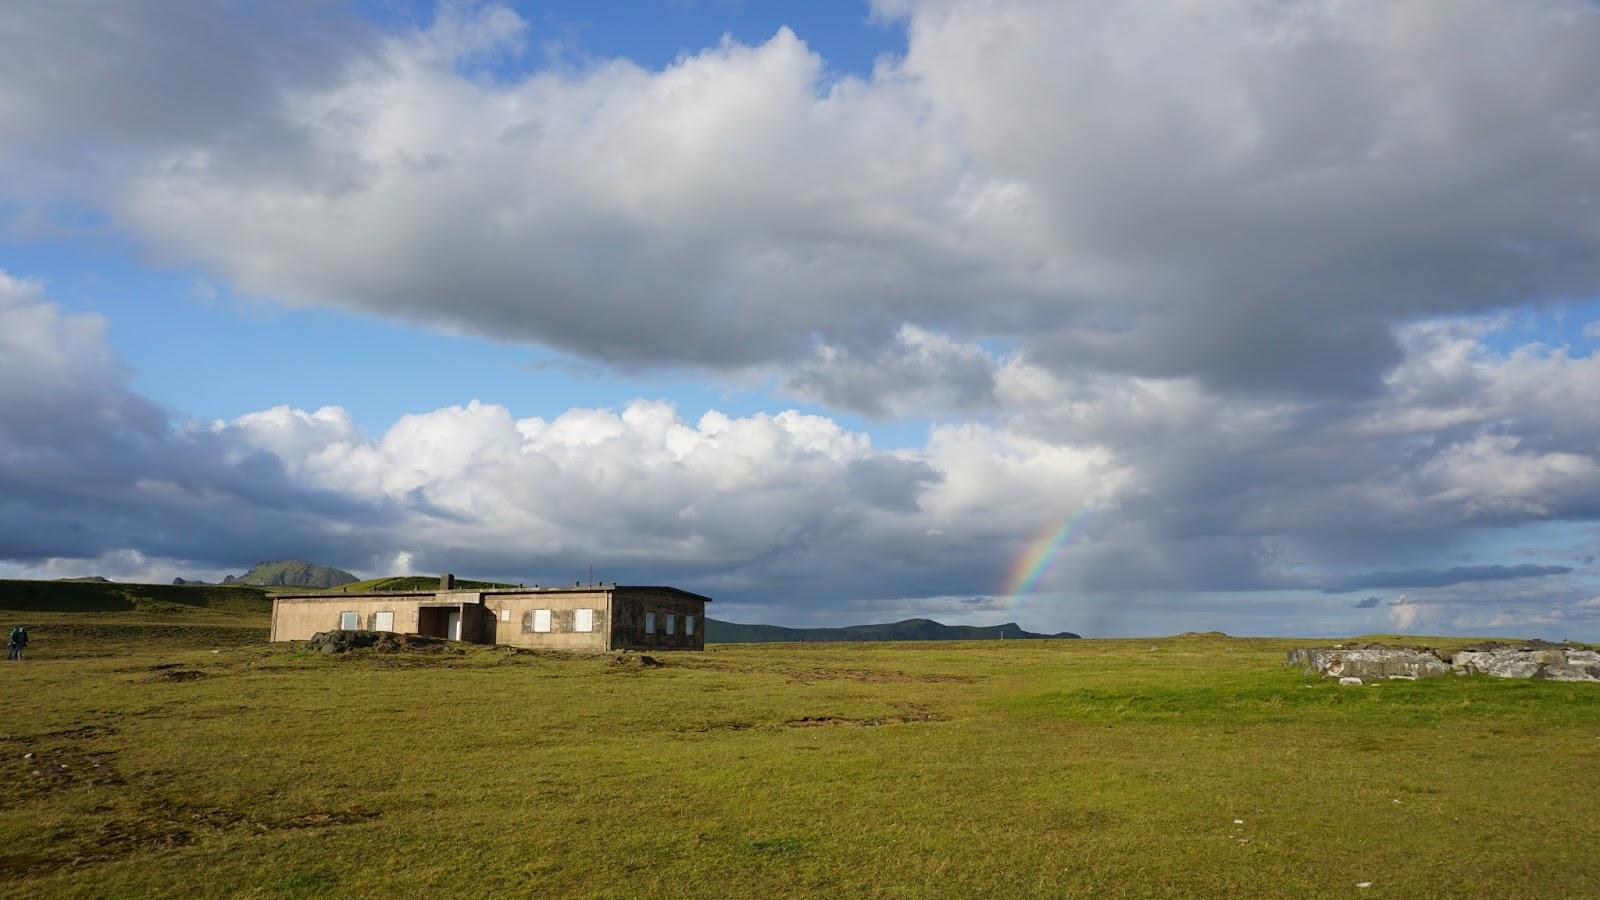 góra w Viku, Vikurfjall, zielona Islandia, południowa Islandia